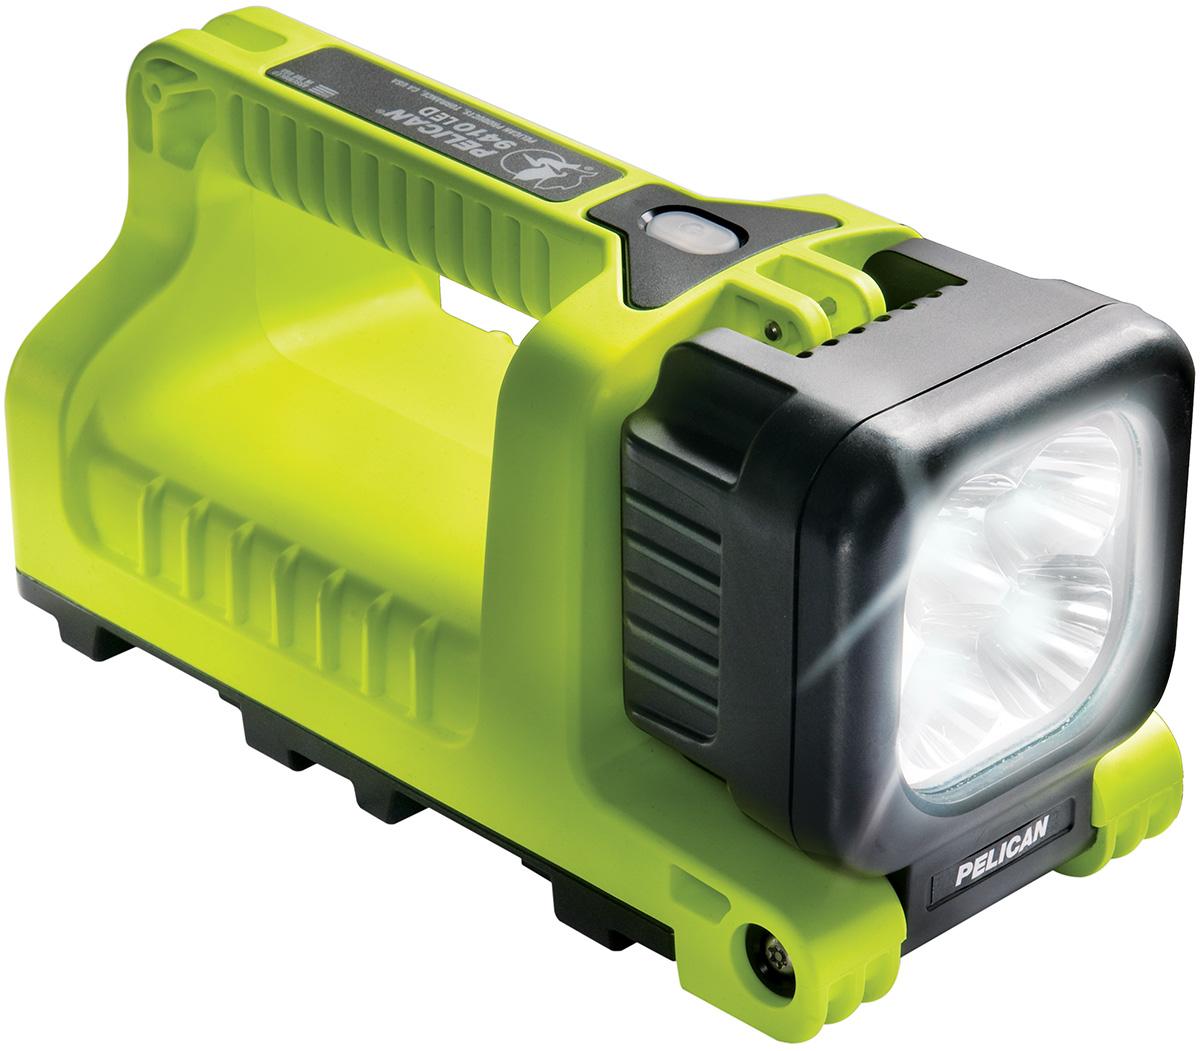 pelican peli products 9410L led firefighter lantern flashlight